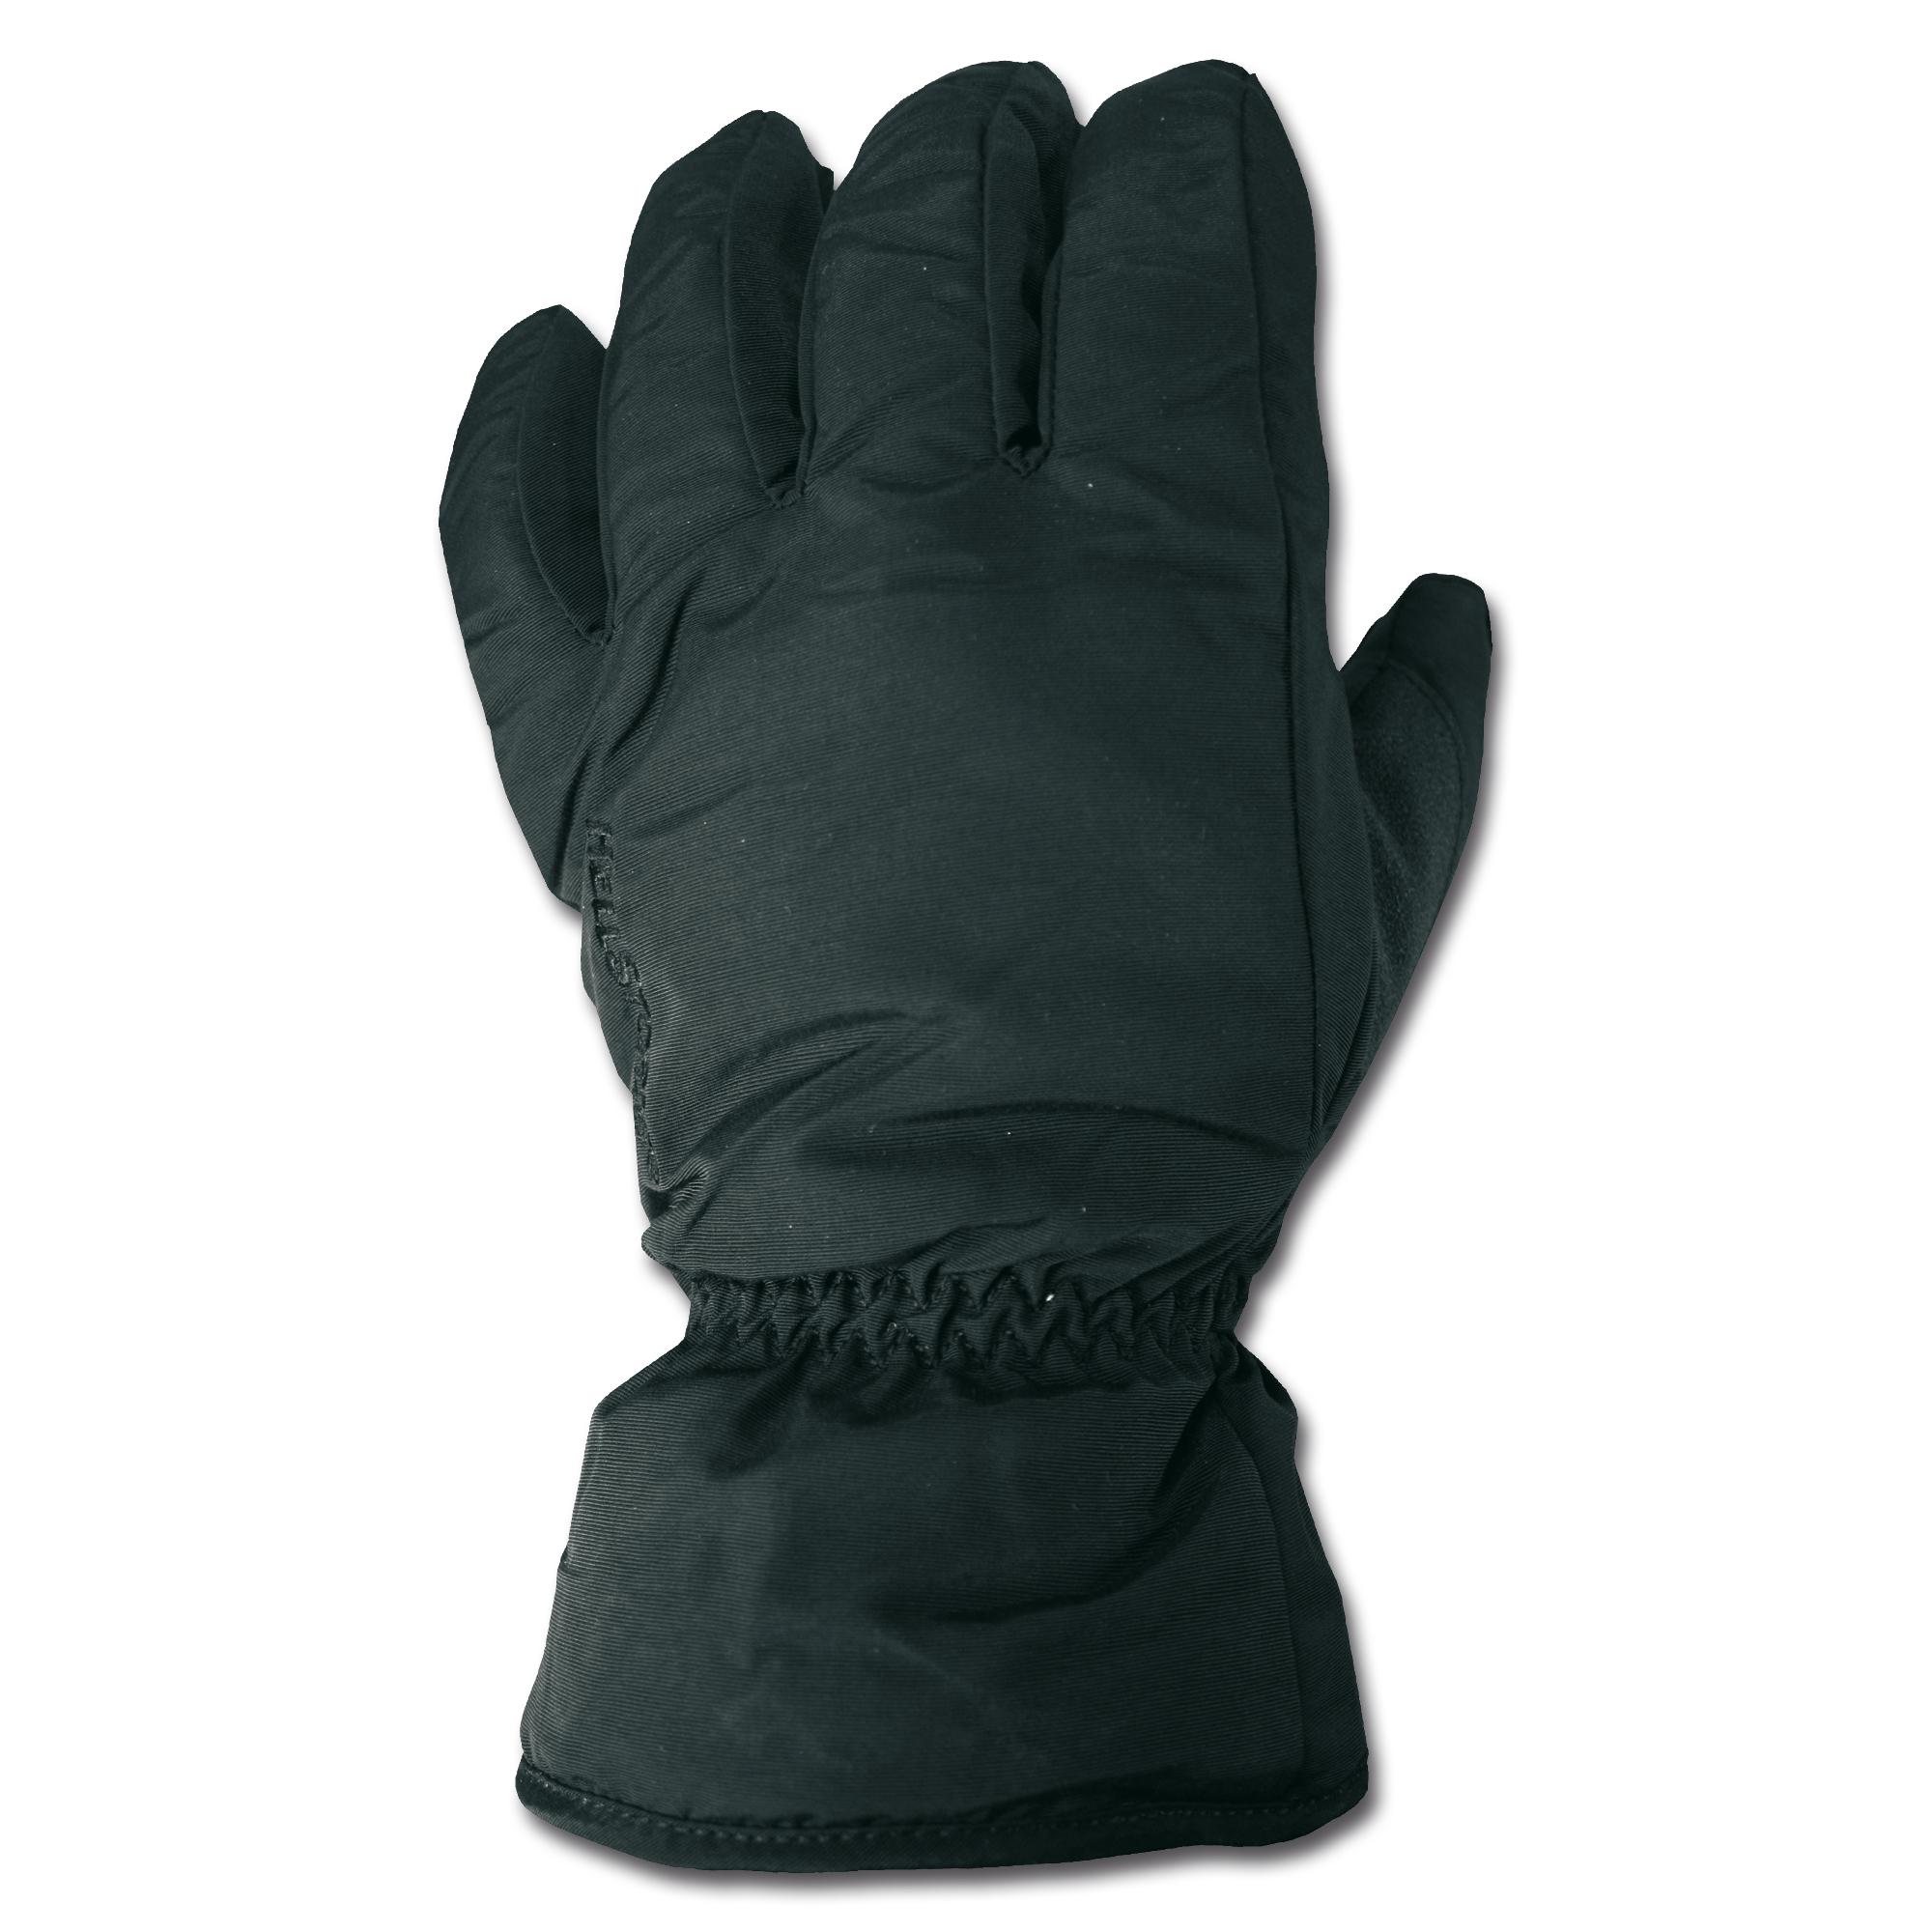 Handschuhe Blackhawk ECW